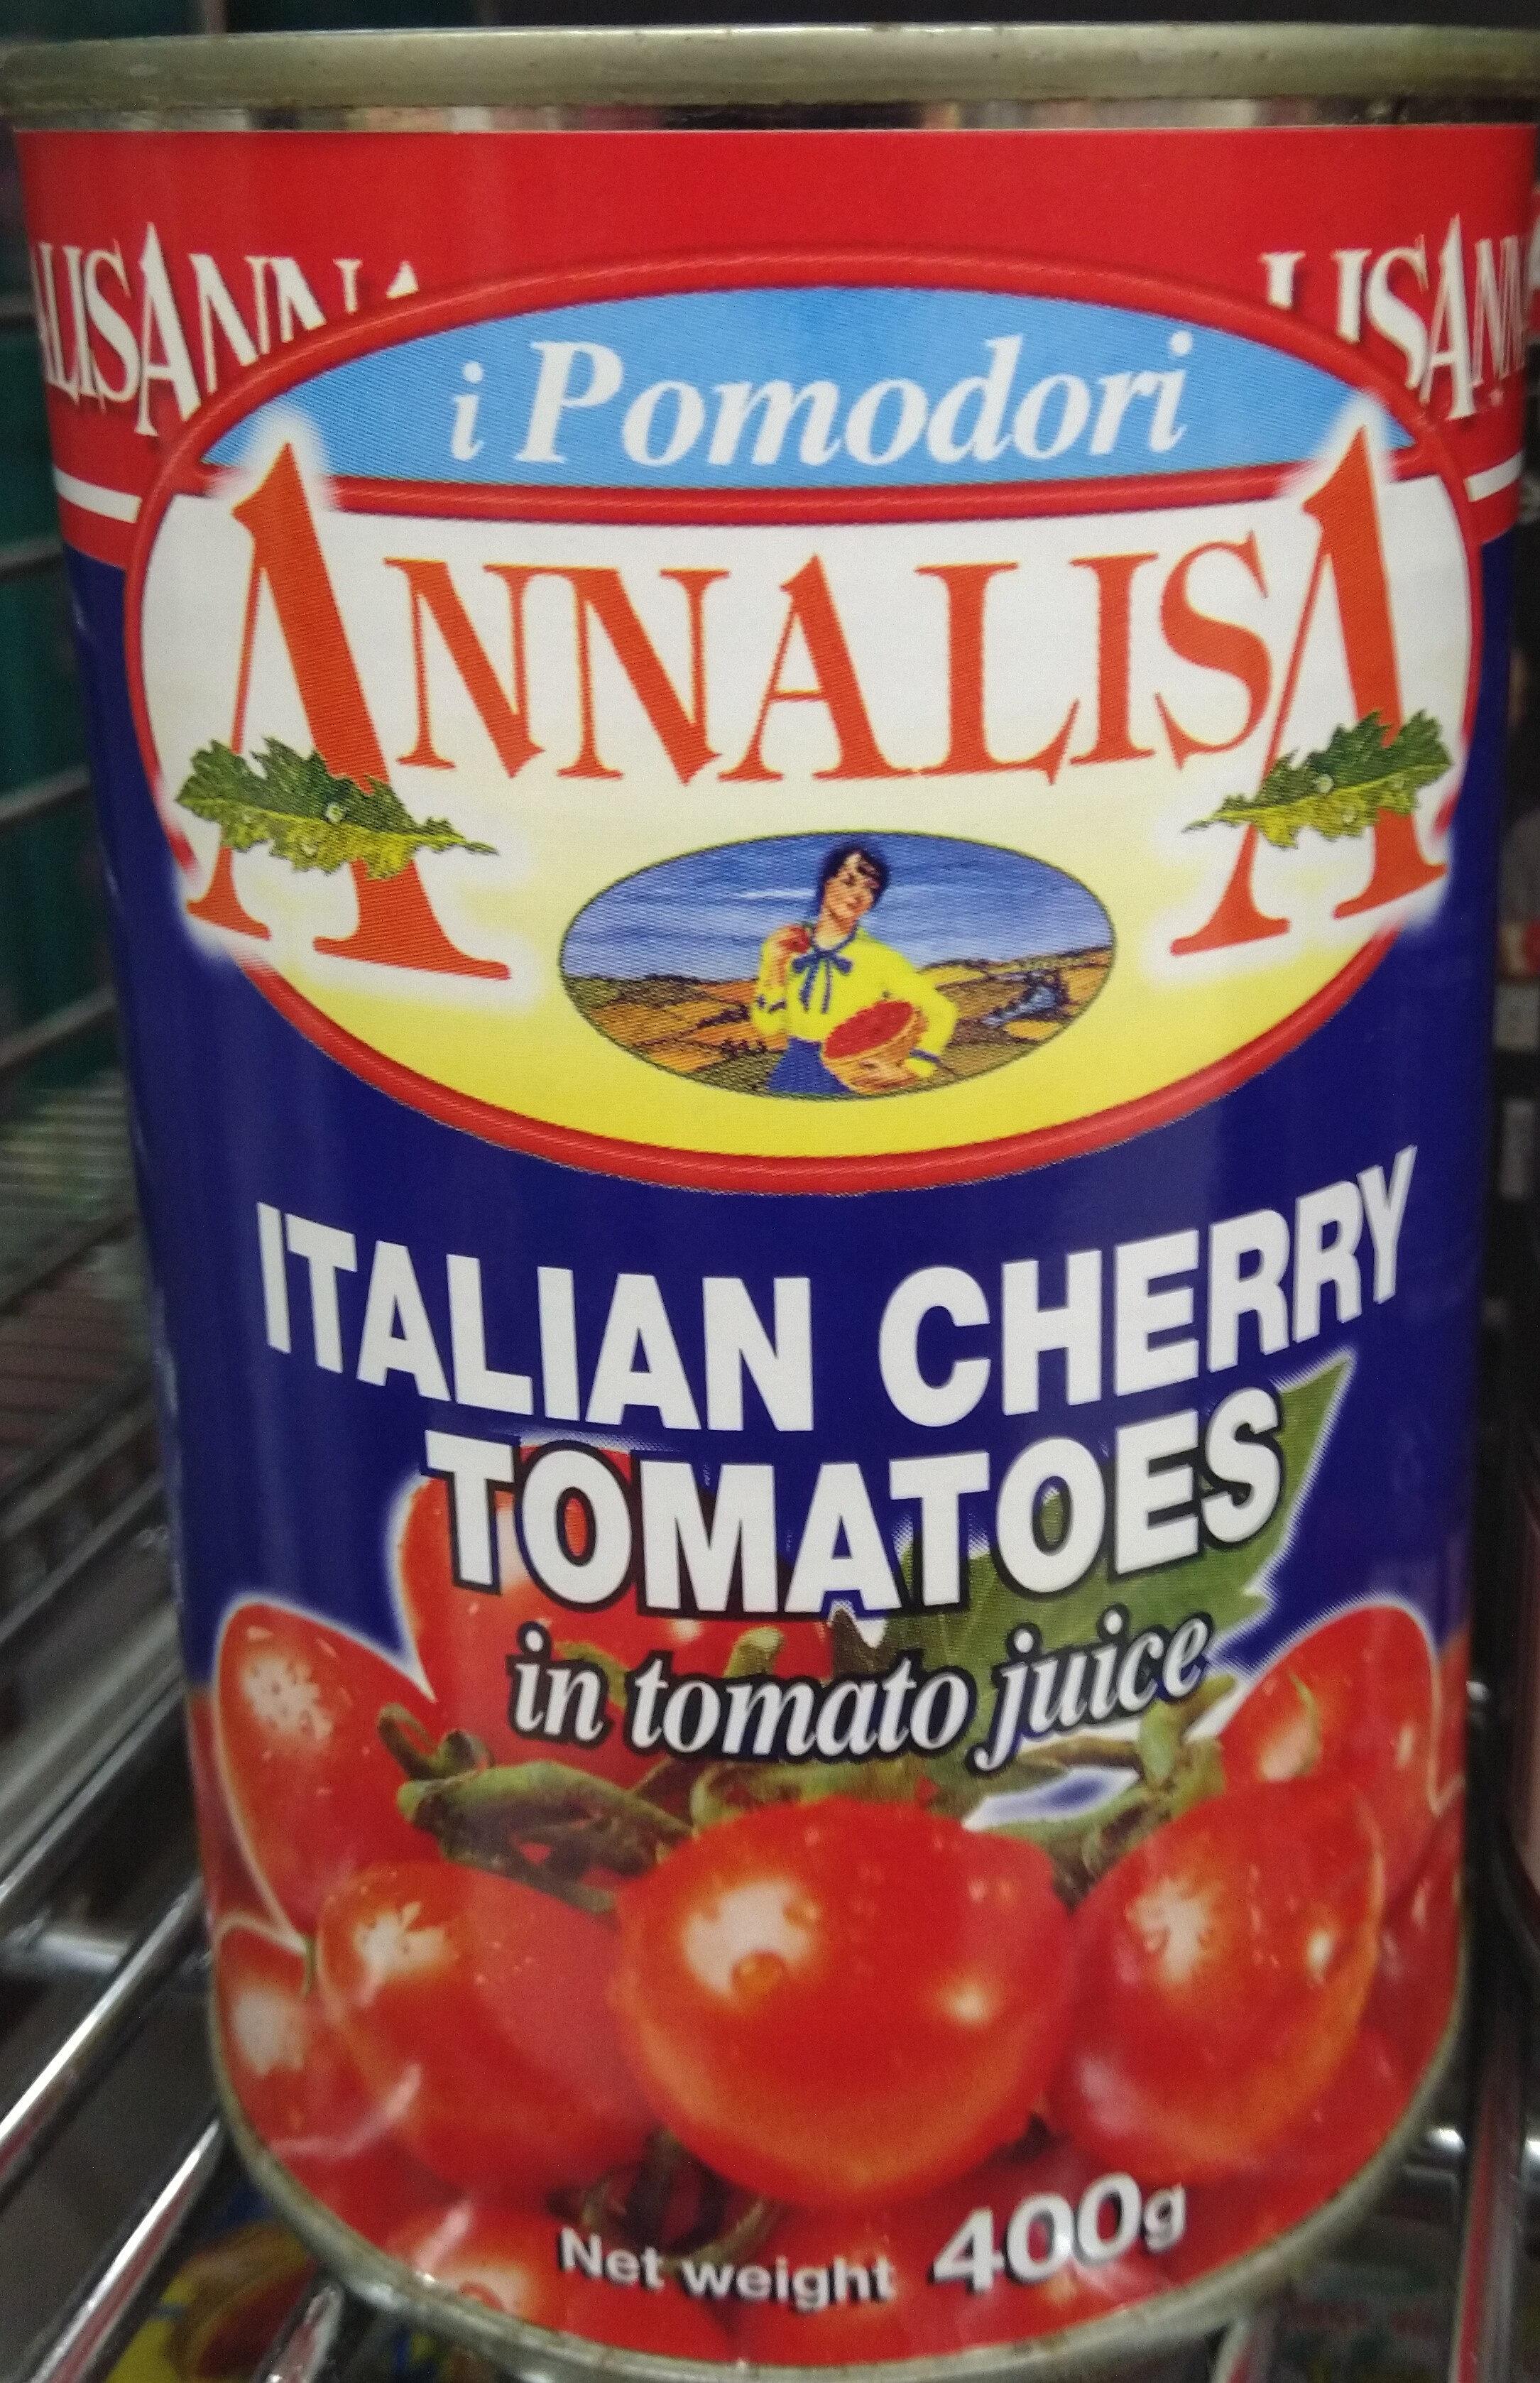 Italian Cherry Tomatoes - Product - en